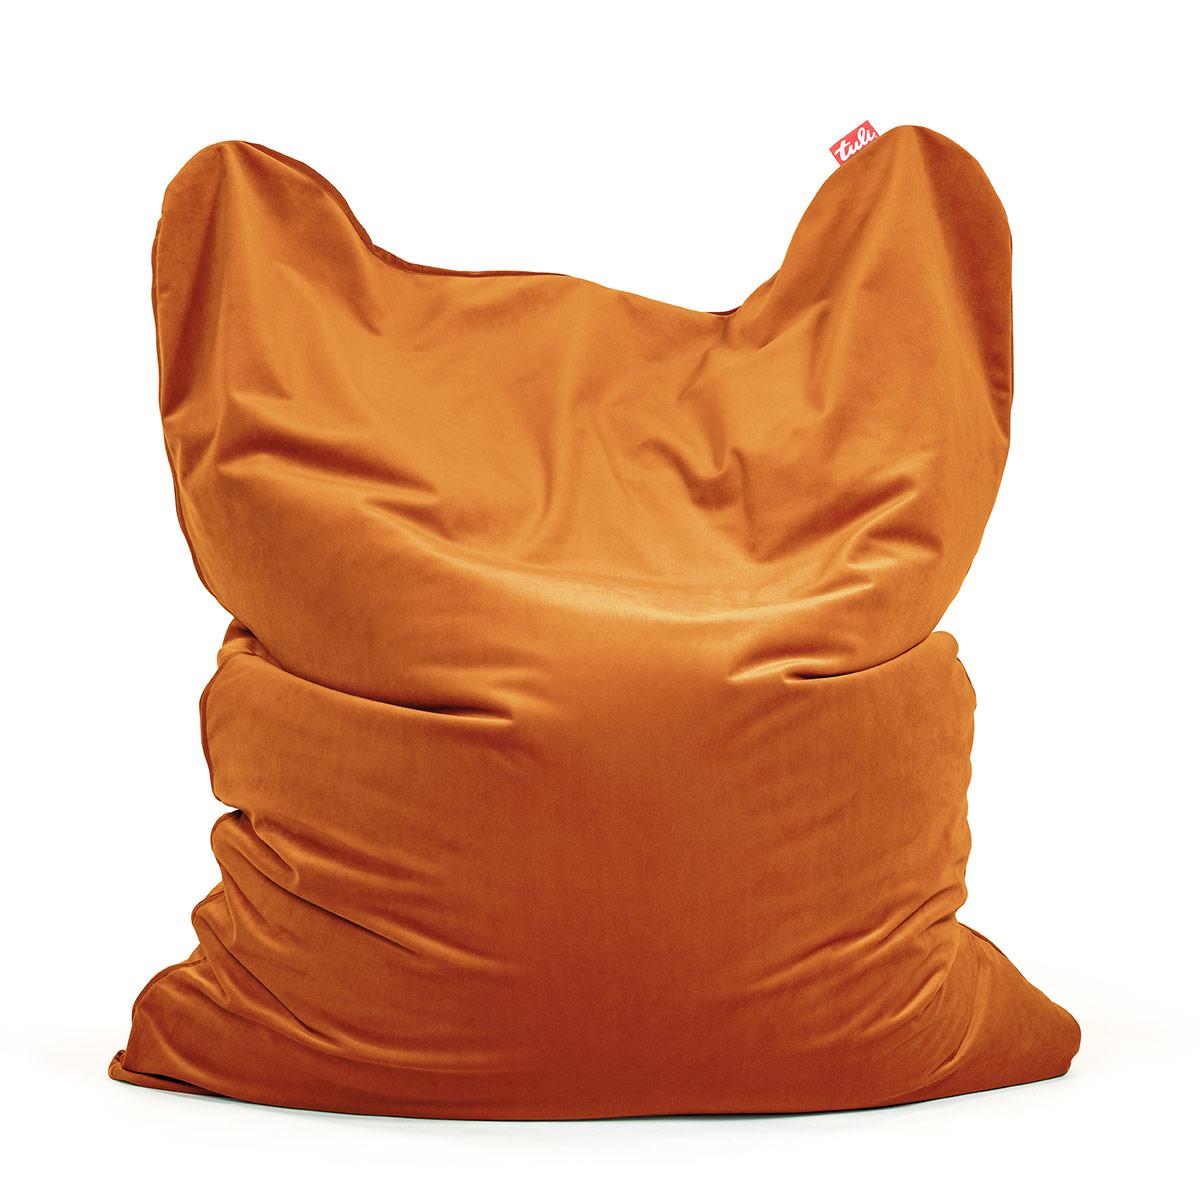 Full Size of Sofa Abnehmbarer Bezug Sofas Modulares Mit Abnehmbarem Ikea Abnehmbaren Big Grau Waschbarer Abnehmbar Waschbar Hussen Tuli Samt Honiggelb Sitzscke Breit Sofa Sofa Abnehmbarer Bezug